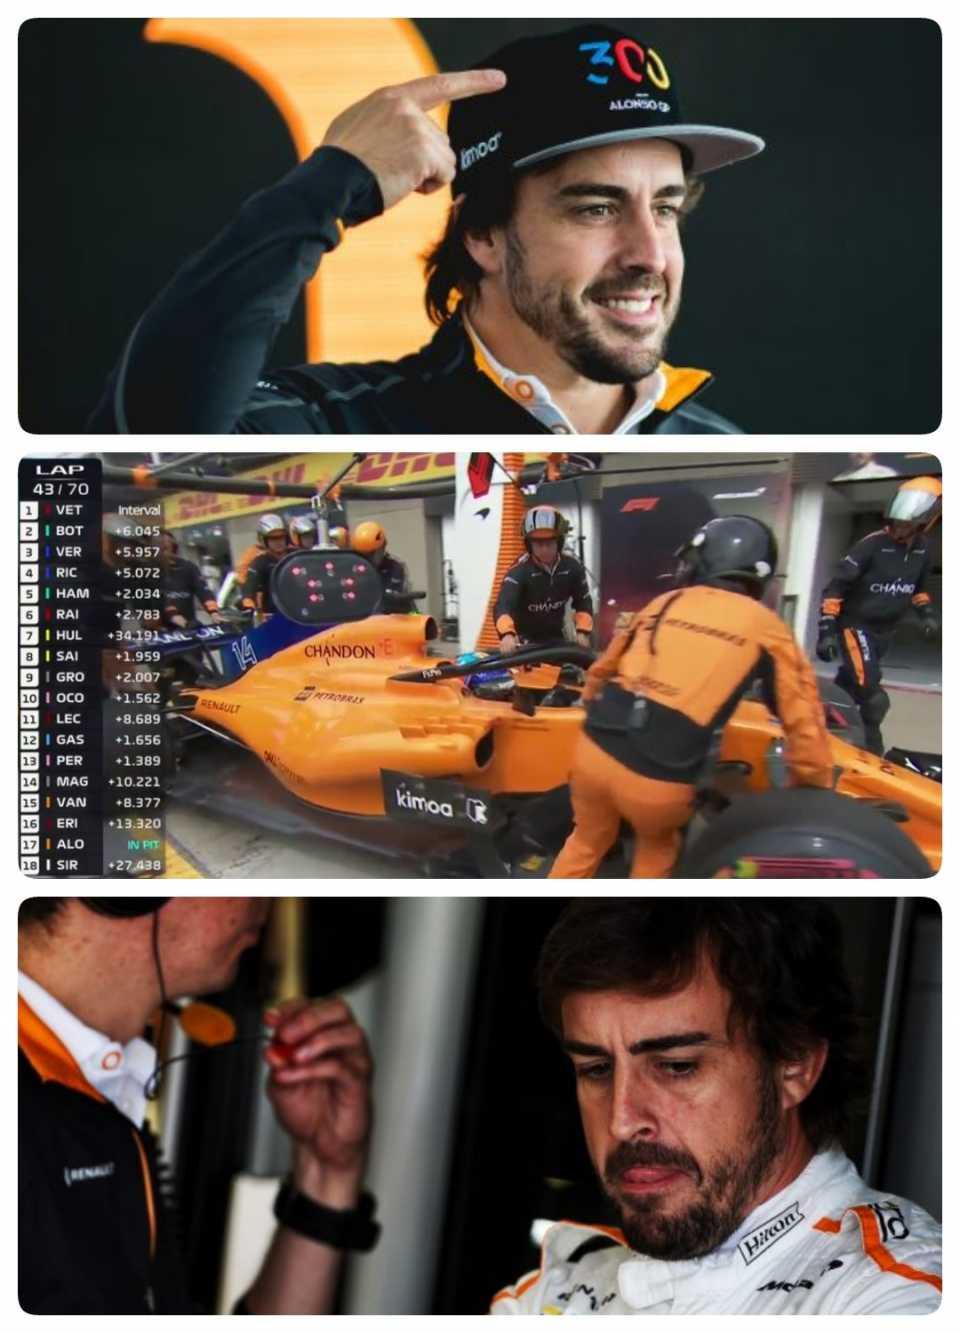 Fernando-Alonso-4-725x500_1528709995060.jpg